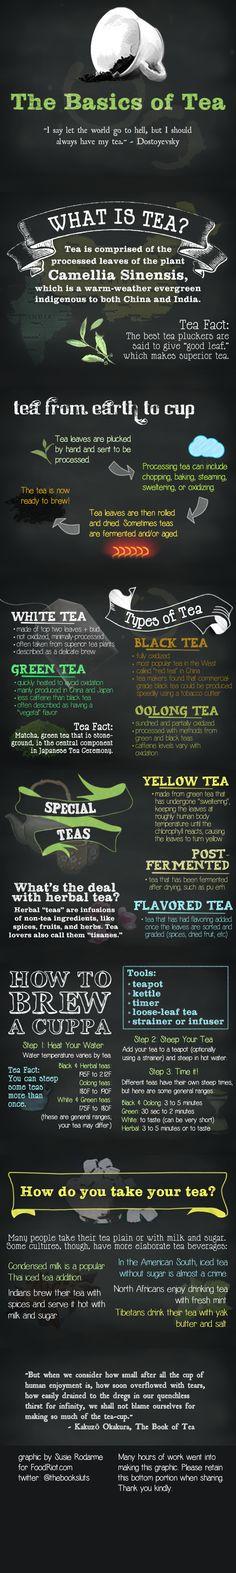 Brush up on some #teatidbits